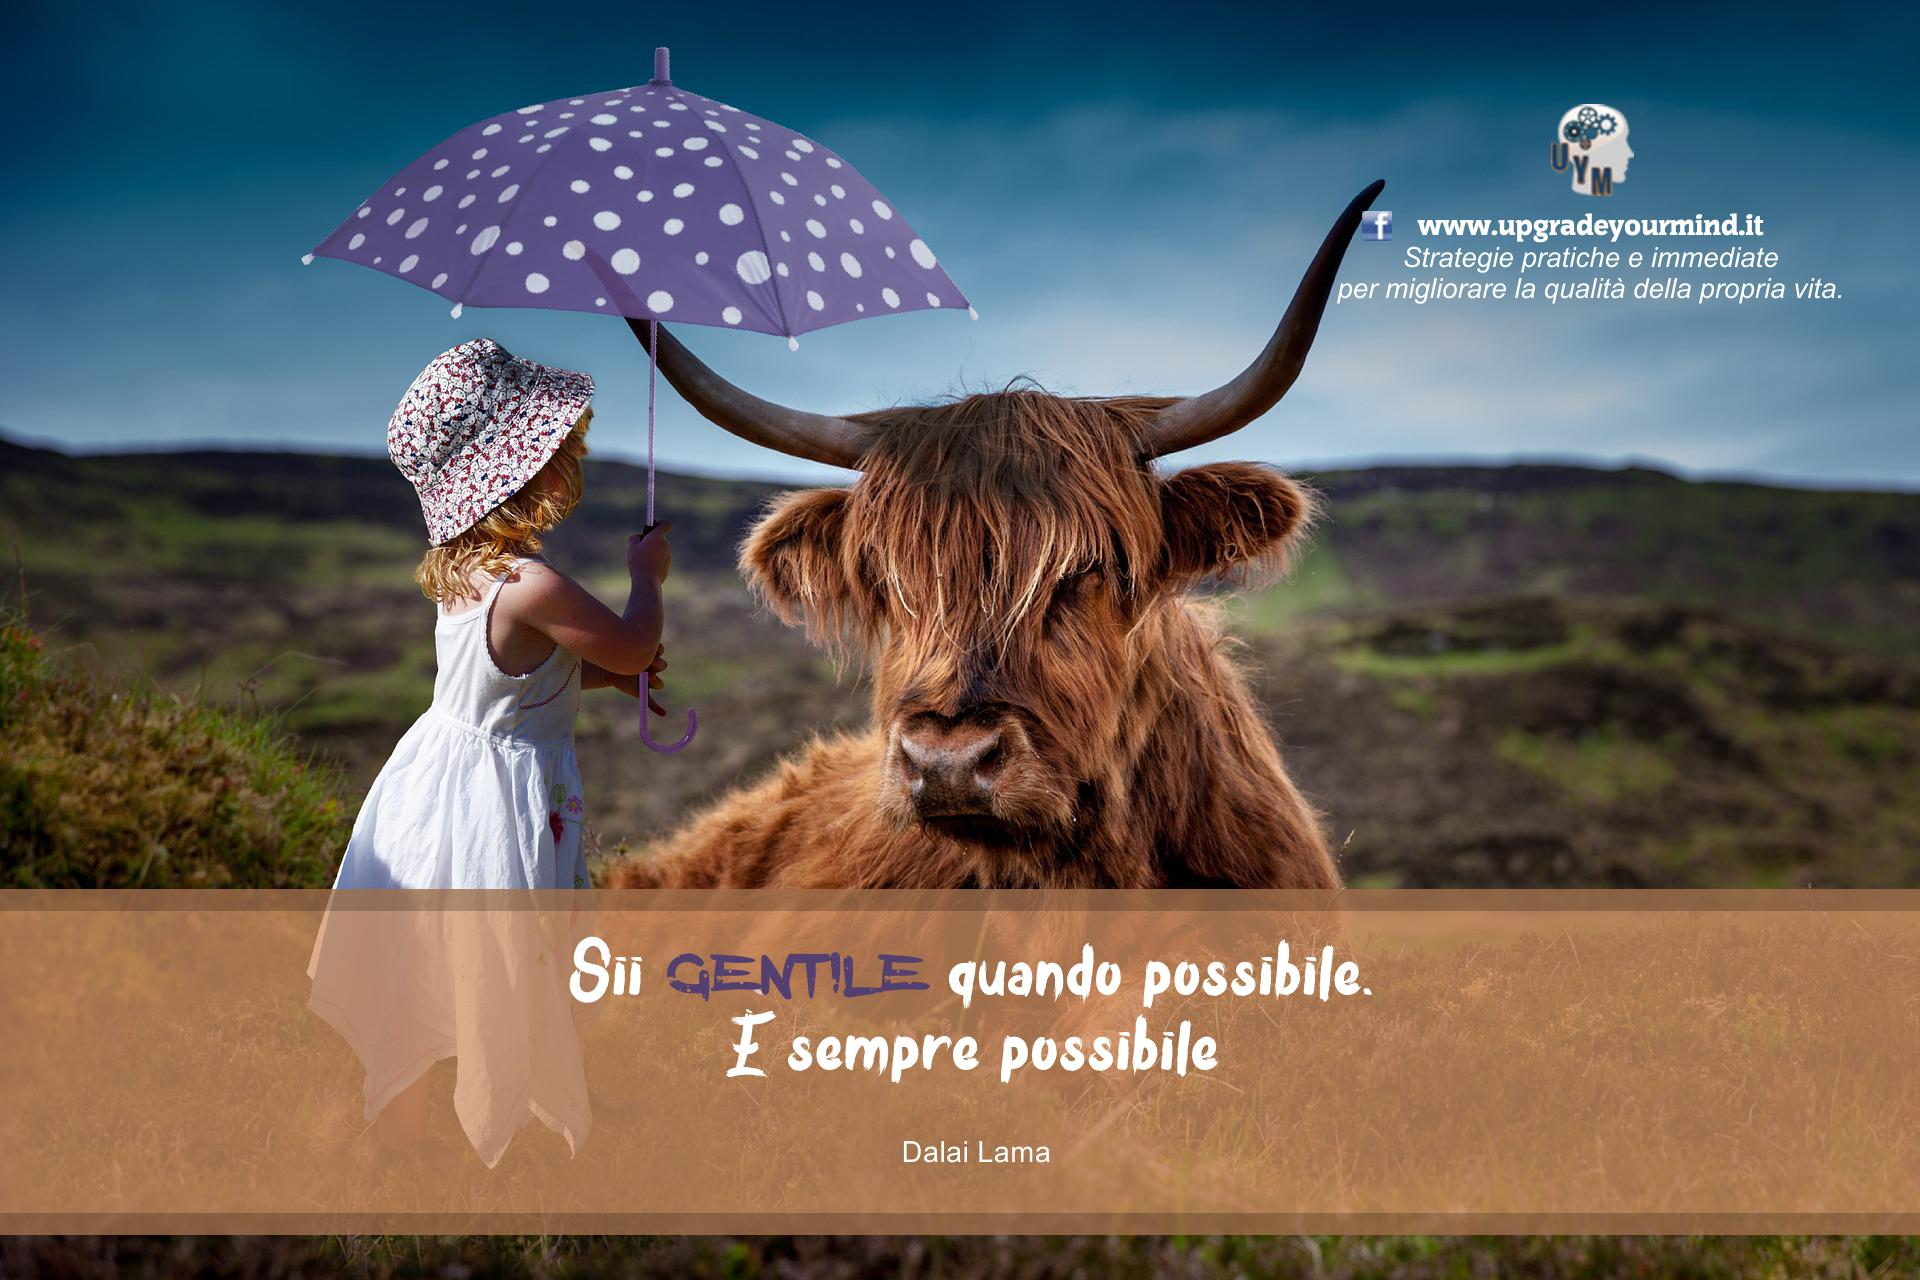 Immagini Belle Con Frasi Significative Su Upgrade Your Mind